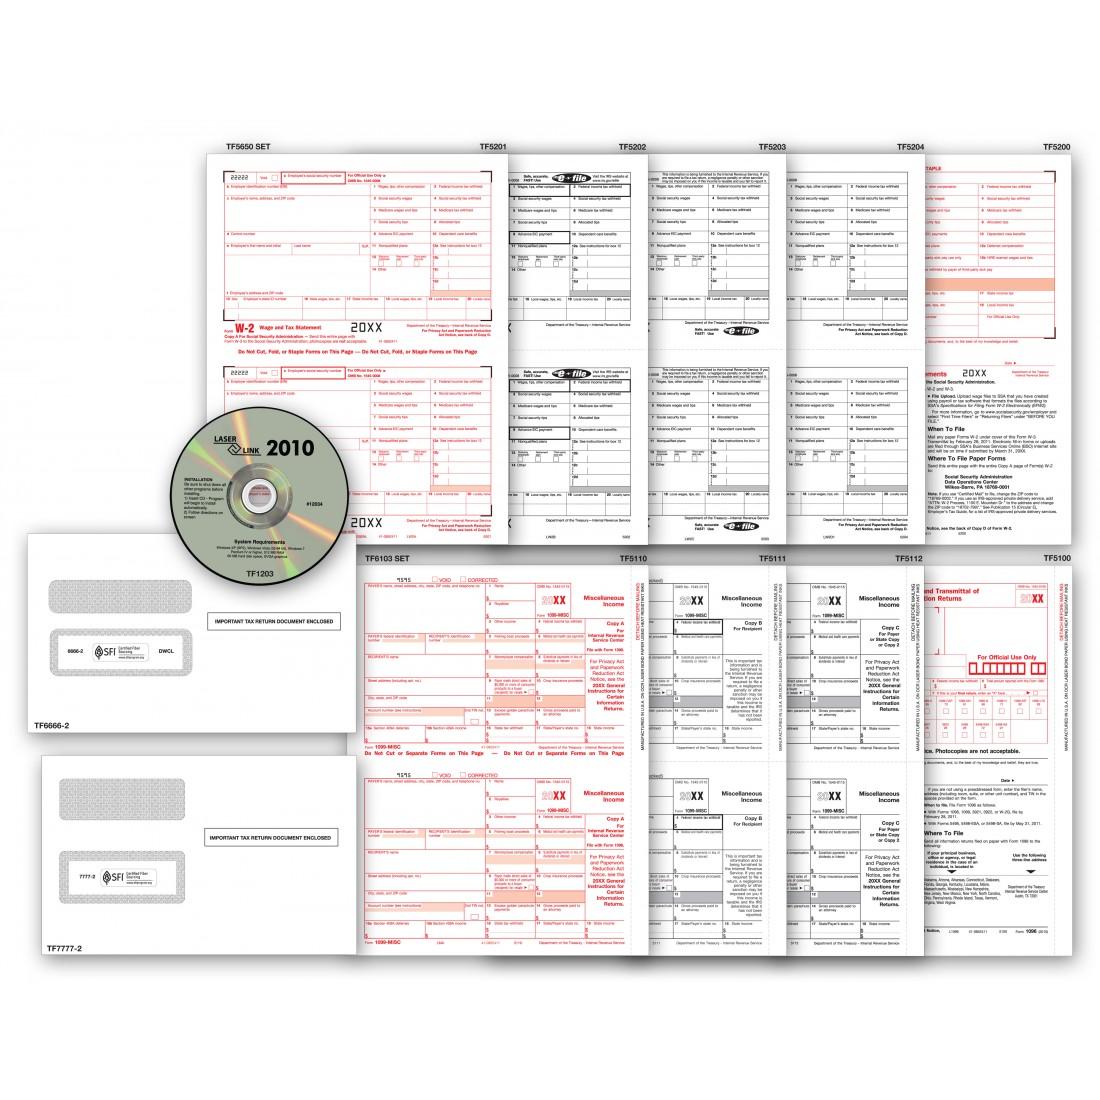 1099 Tax Forms Laser Link Software Kit